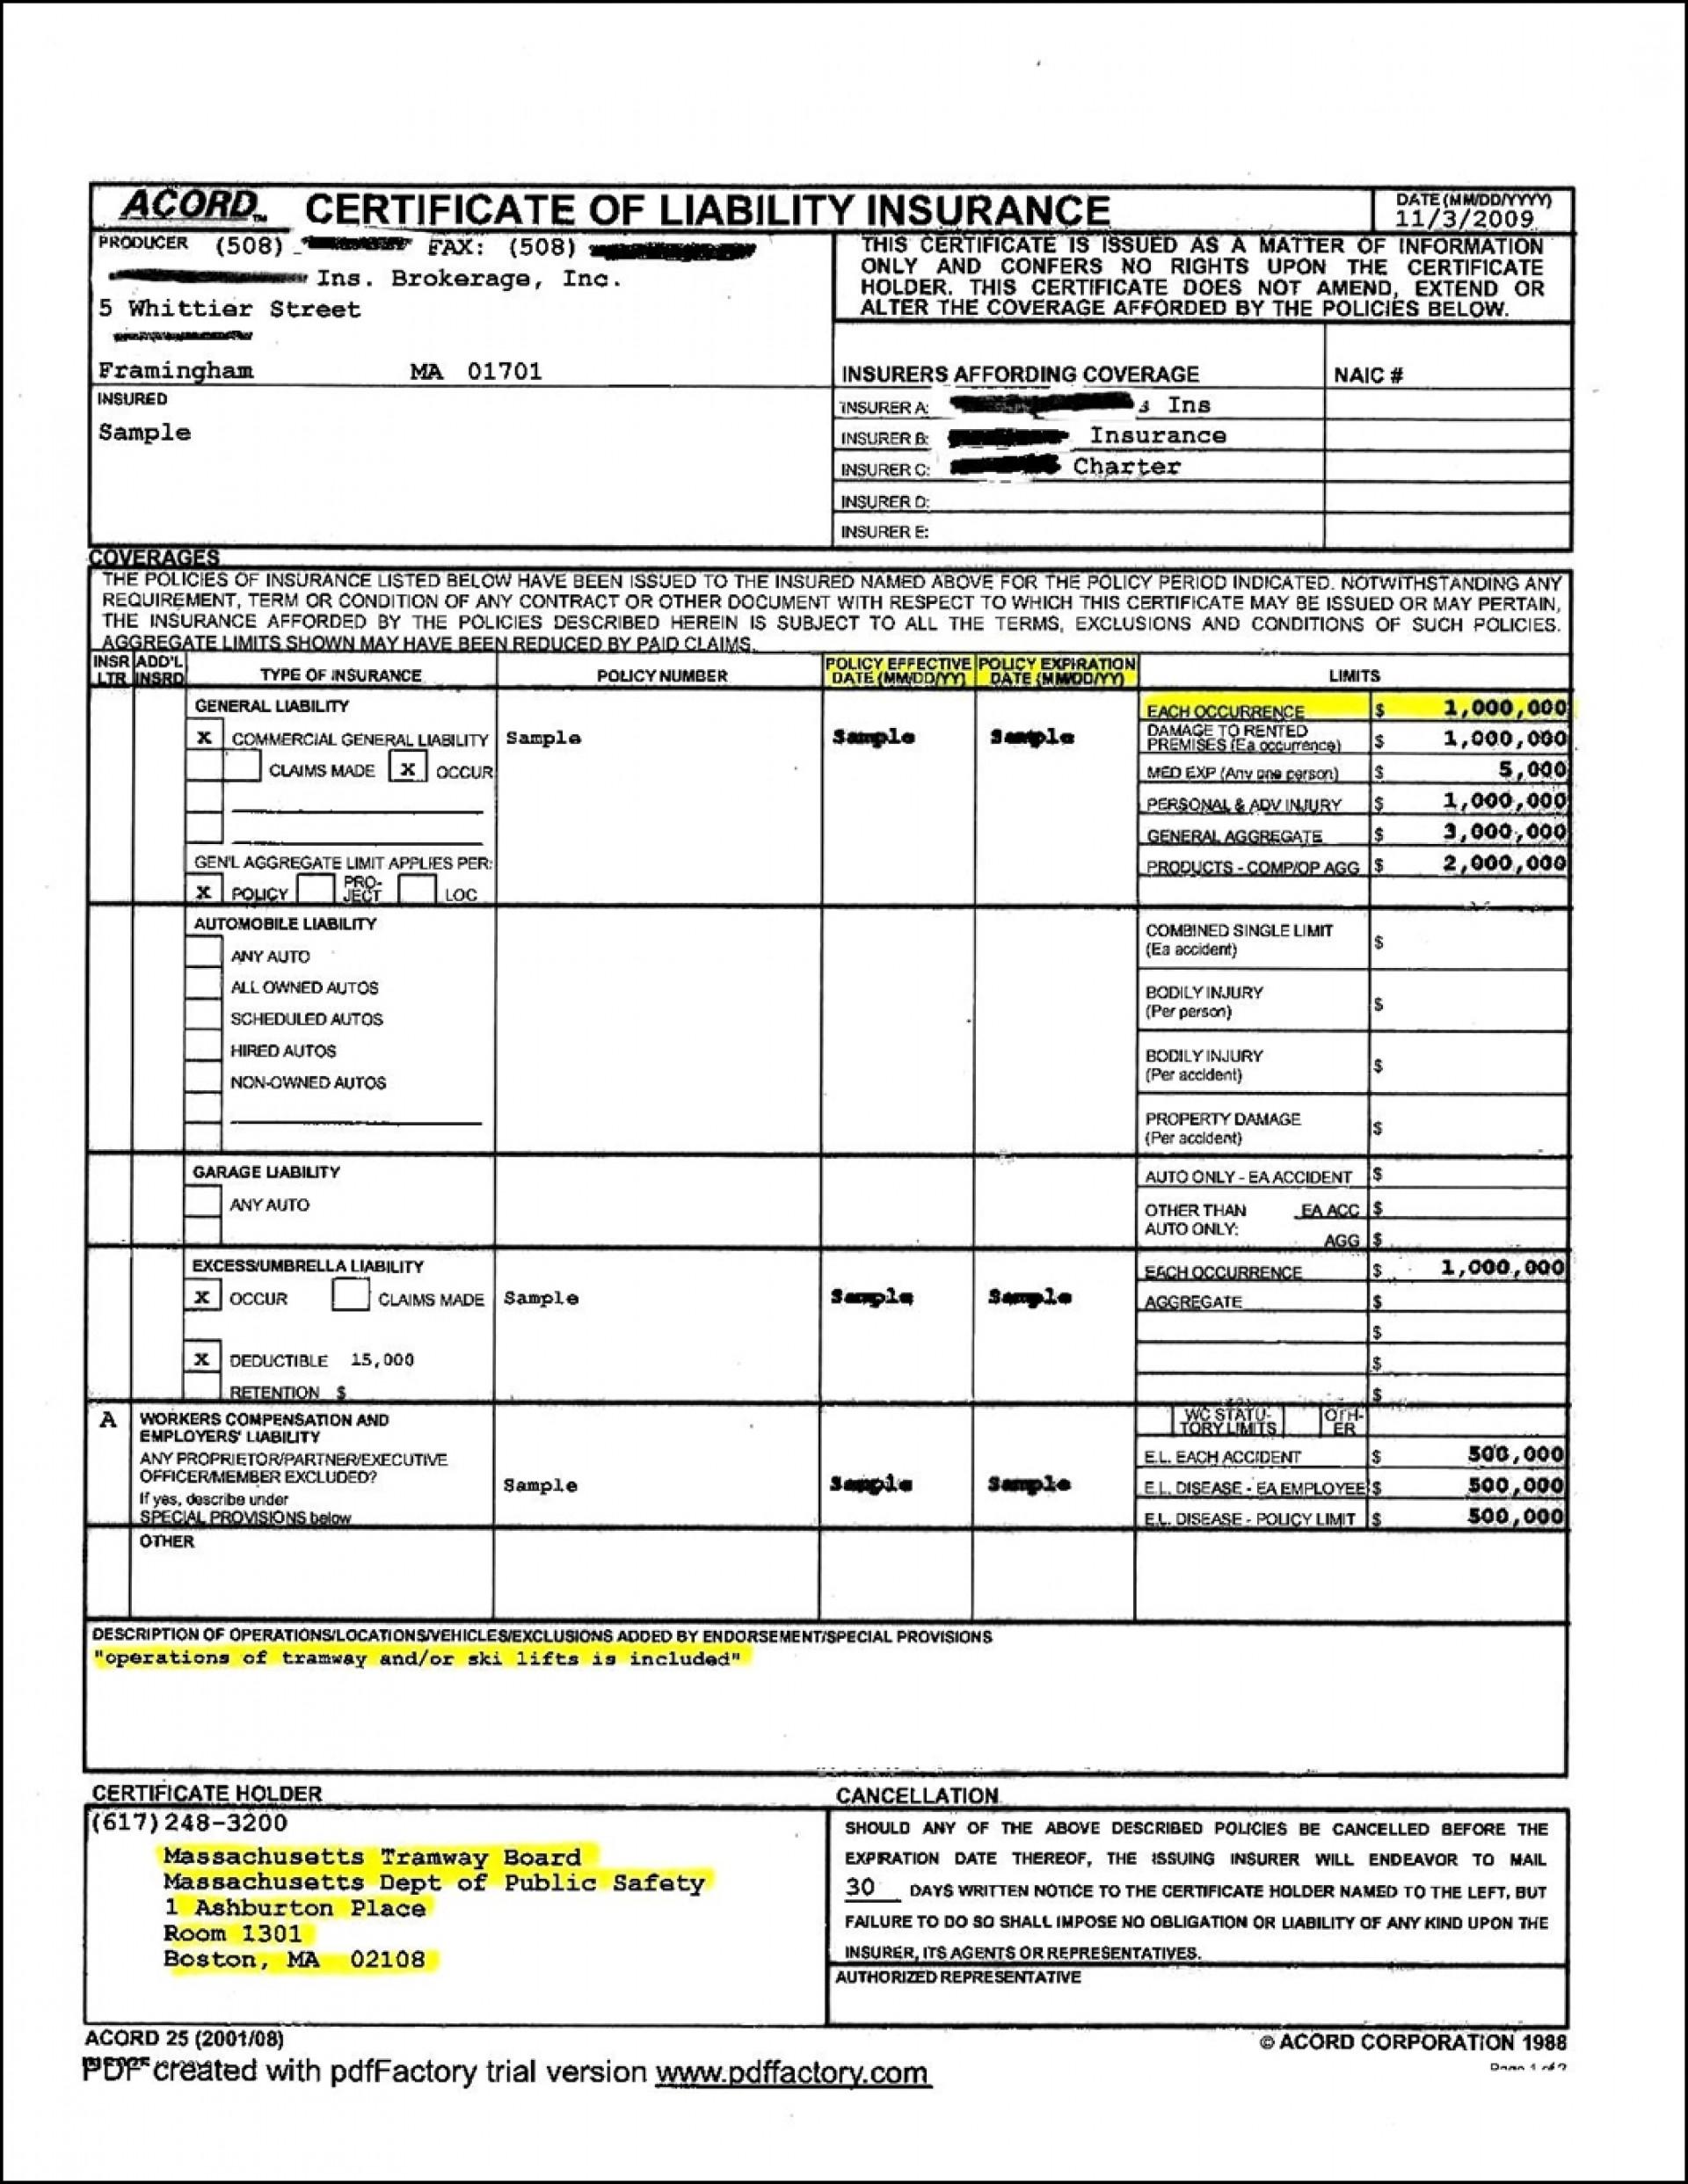 Acord Insurance Form Explanation | MBM Legal